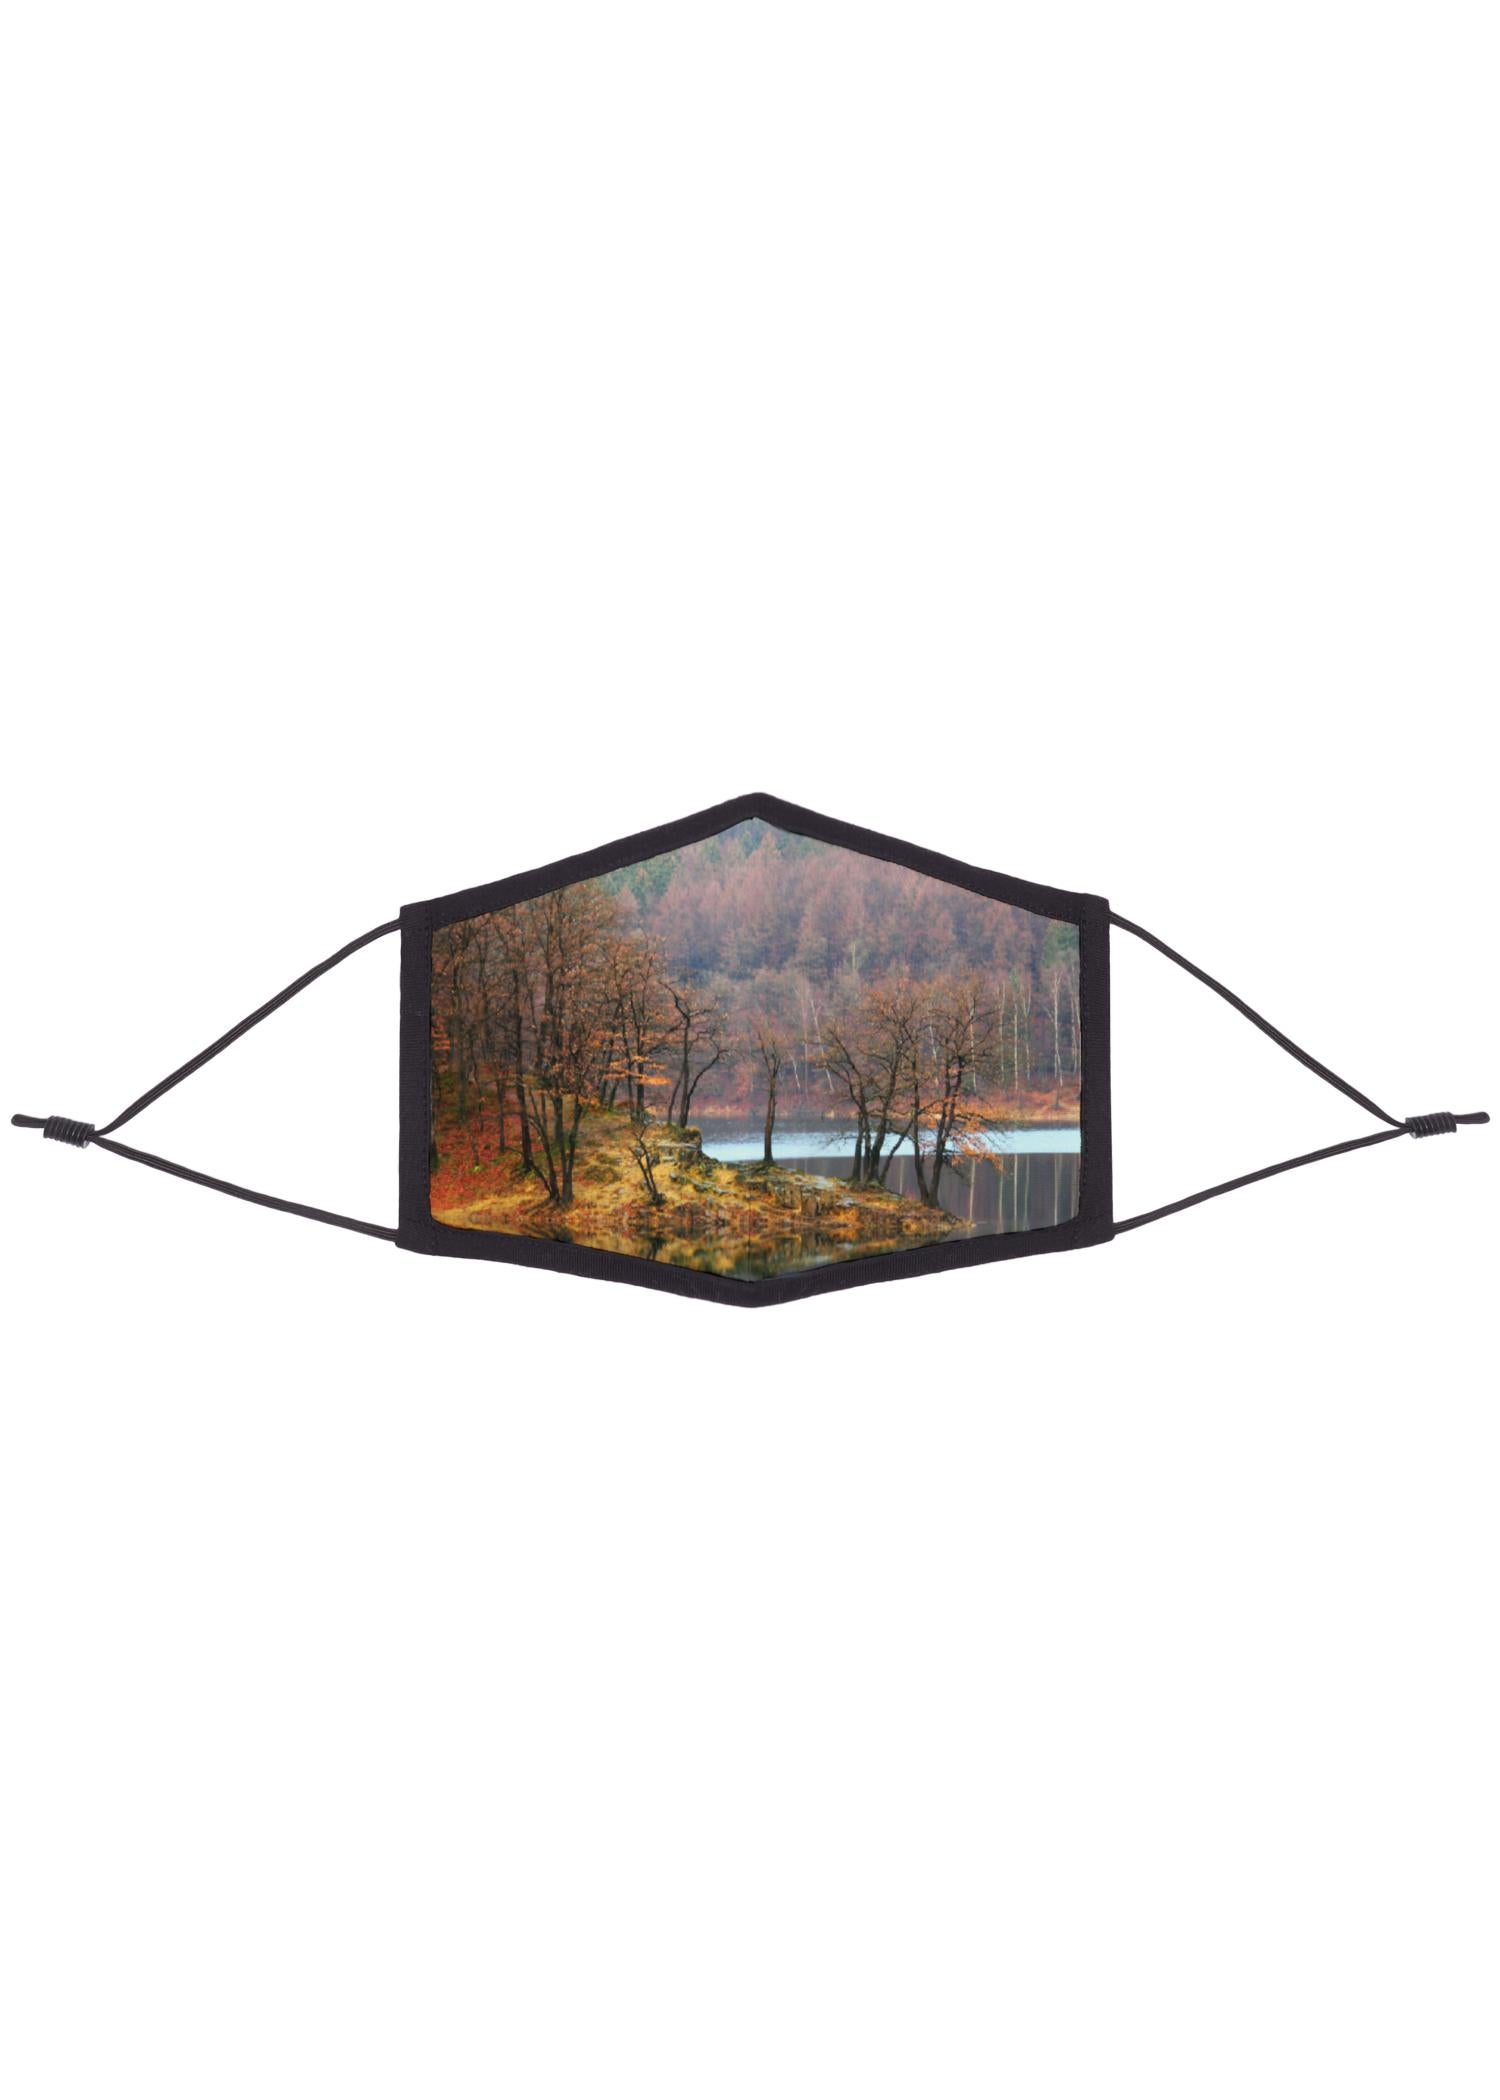 Eco REPREVE Mask - Artist Print Artwork:  Autumn Mirror Lake Trees Designed By: Christine Aka Stine1